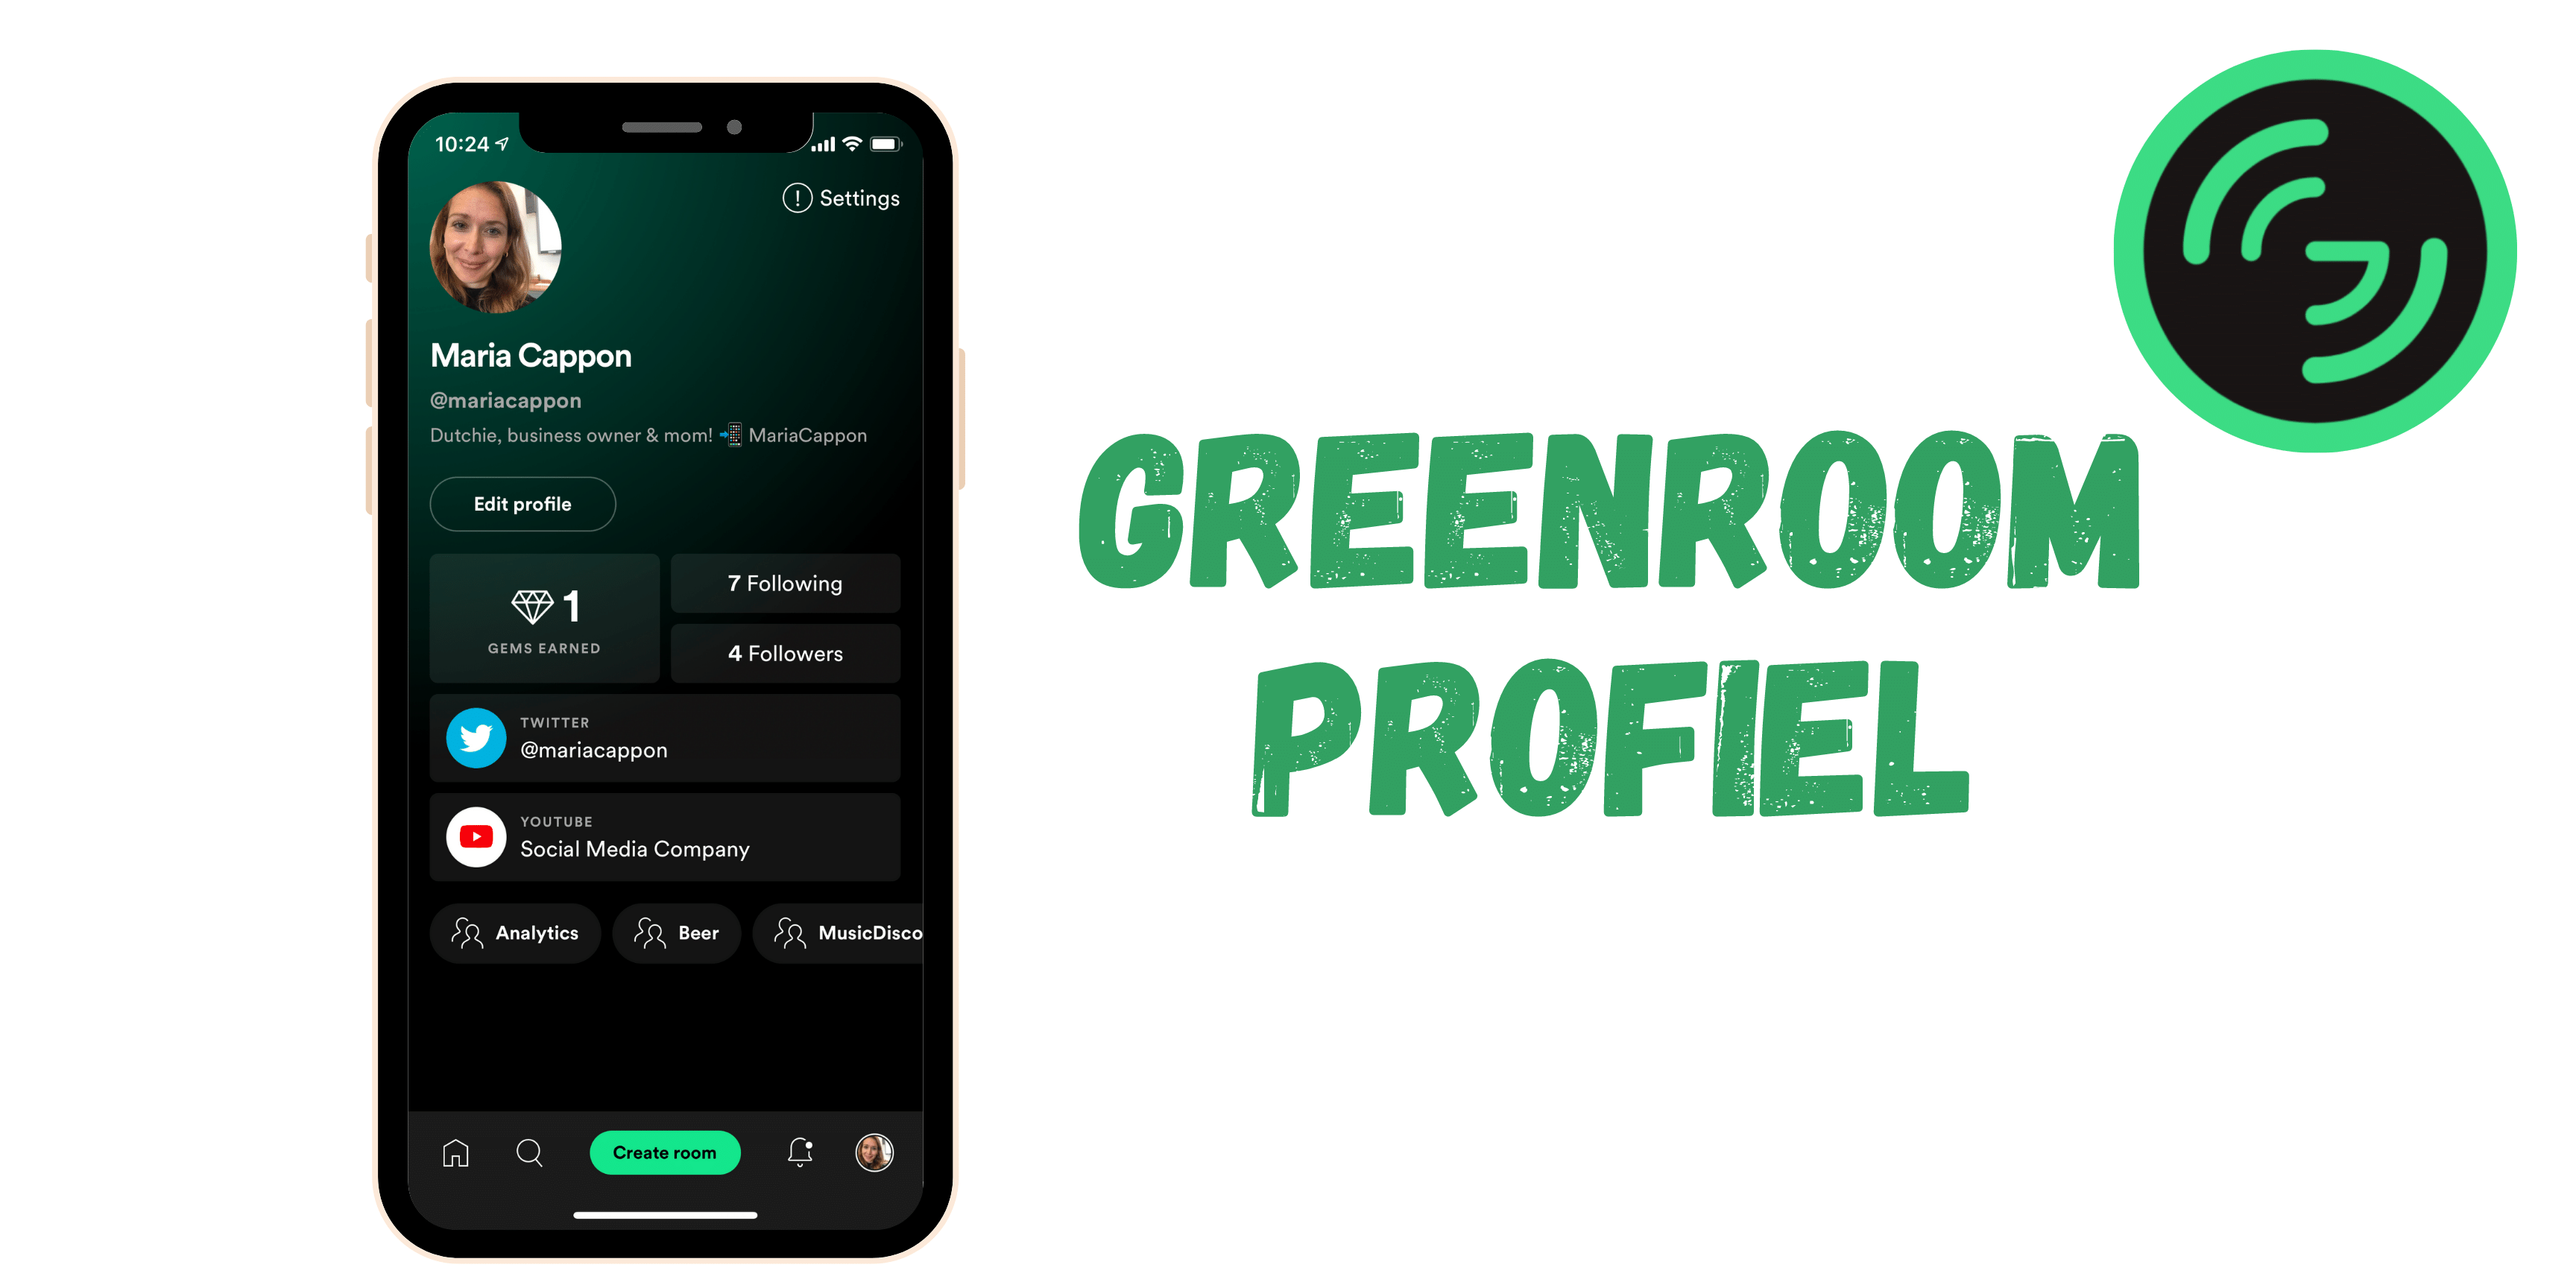 Greenroom profiel & gems